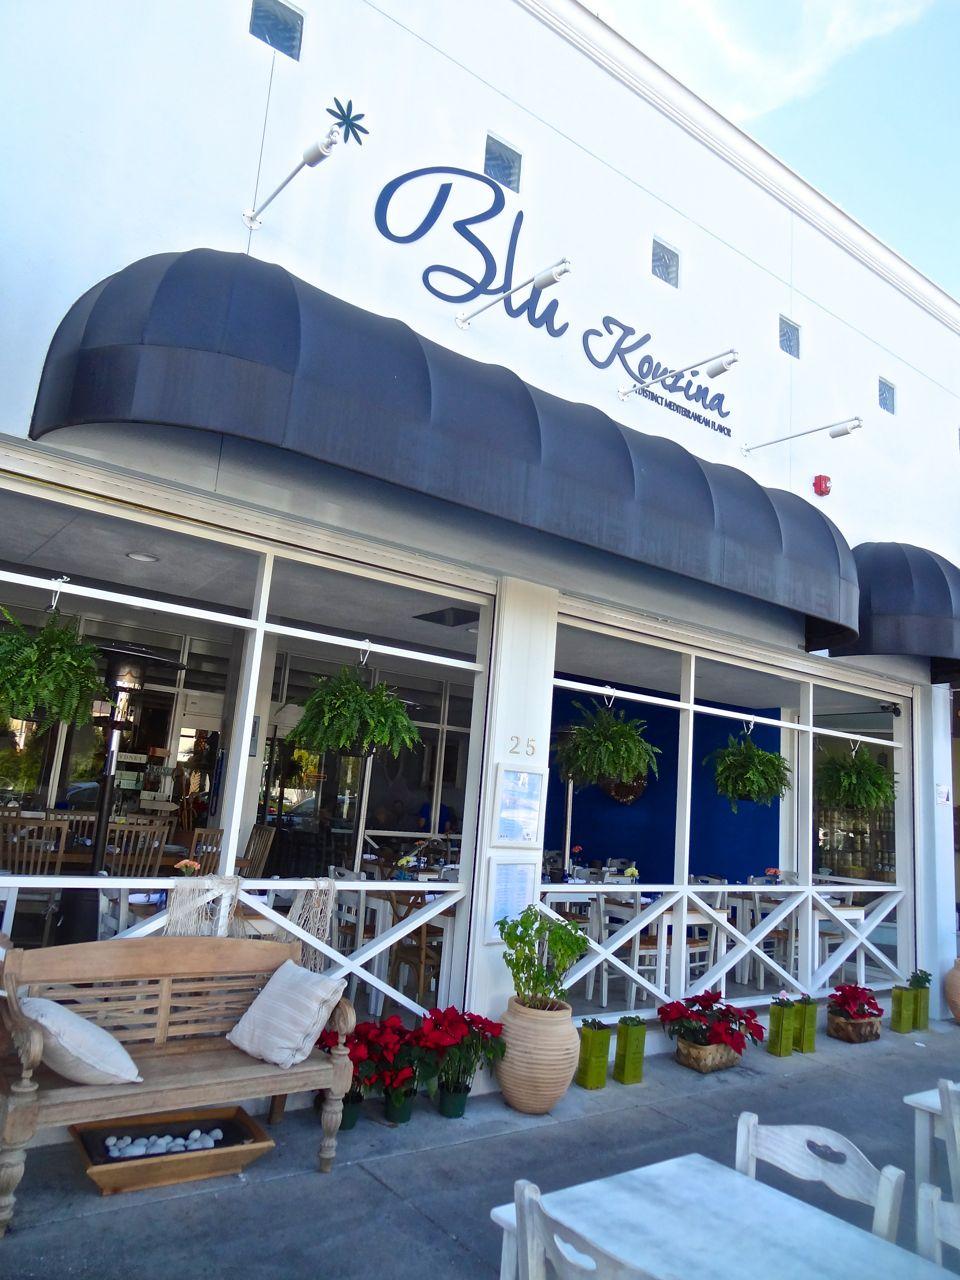 Scrumpdillyicious Blu Kouzina Greek Cuisine On St Armands Circle